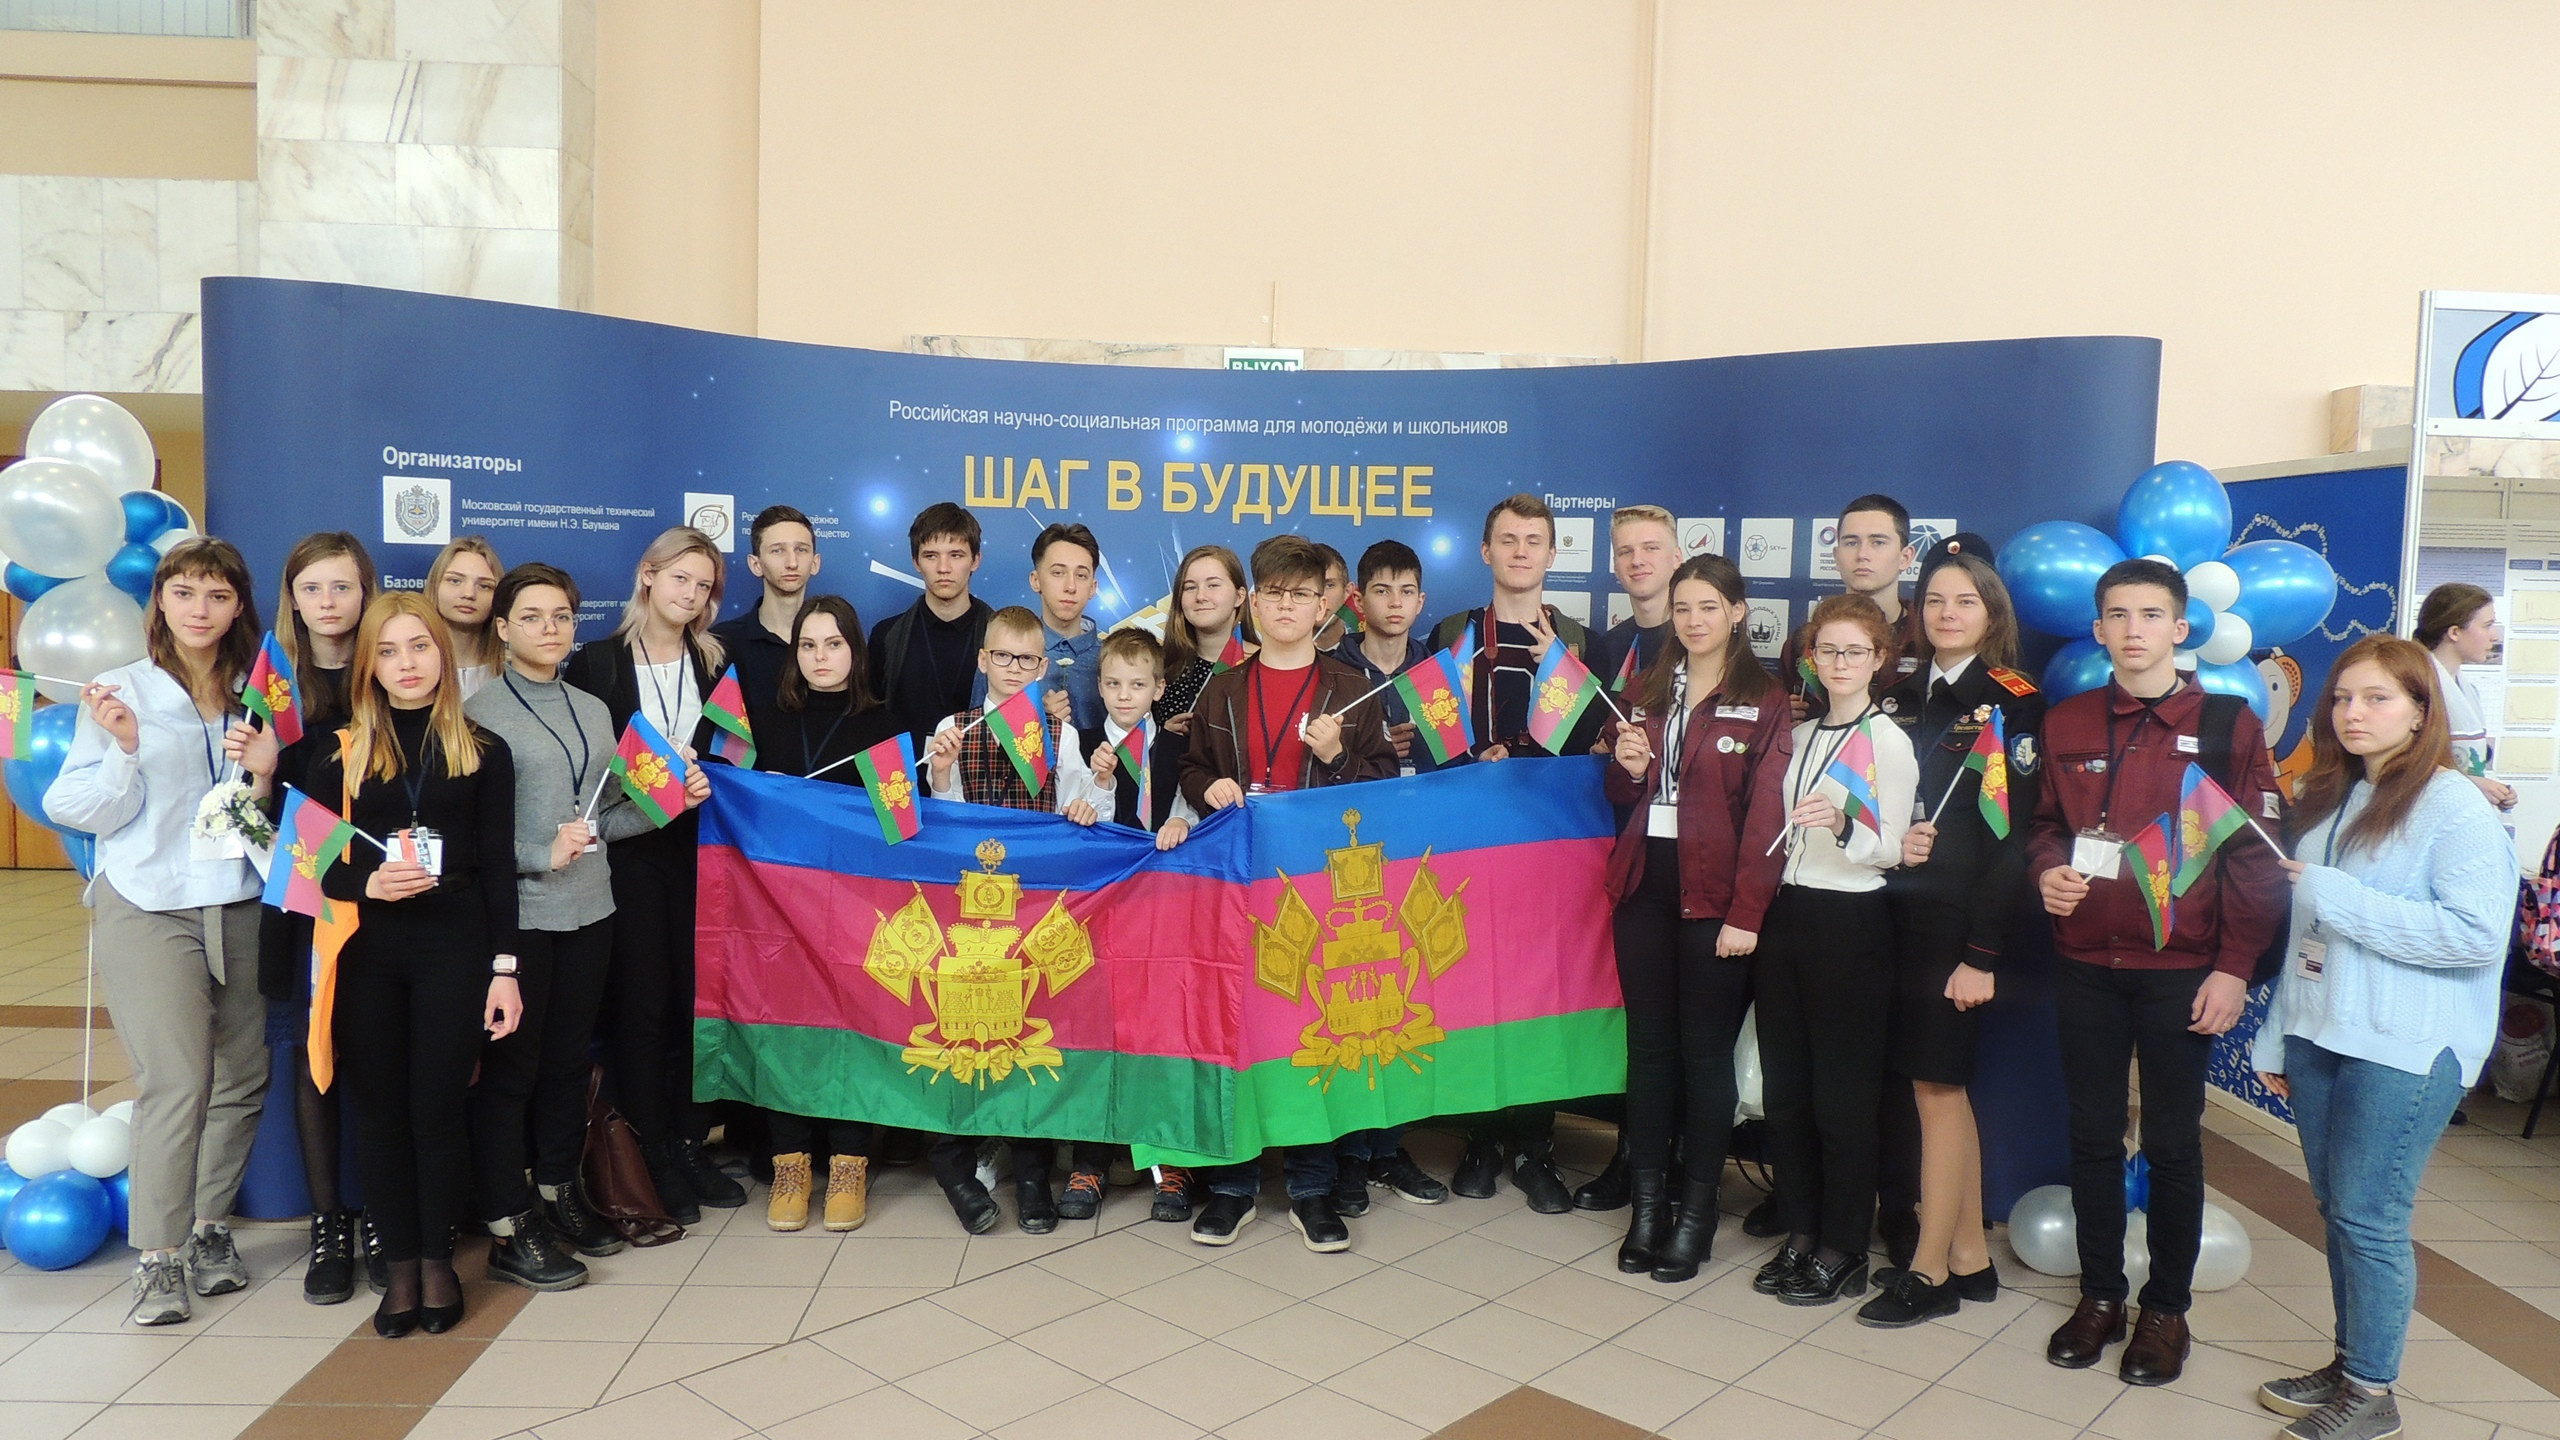 Участники от Краснодарского края